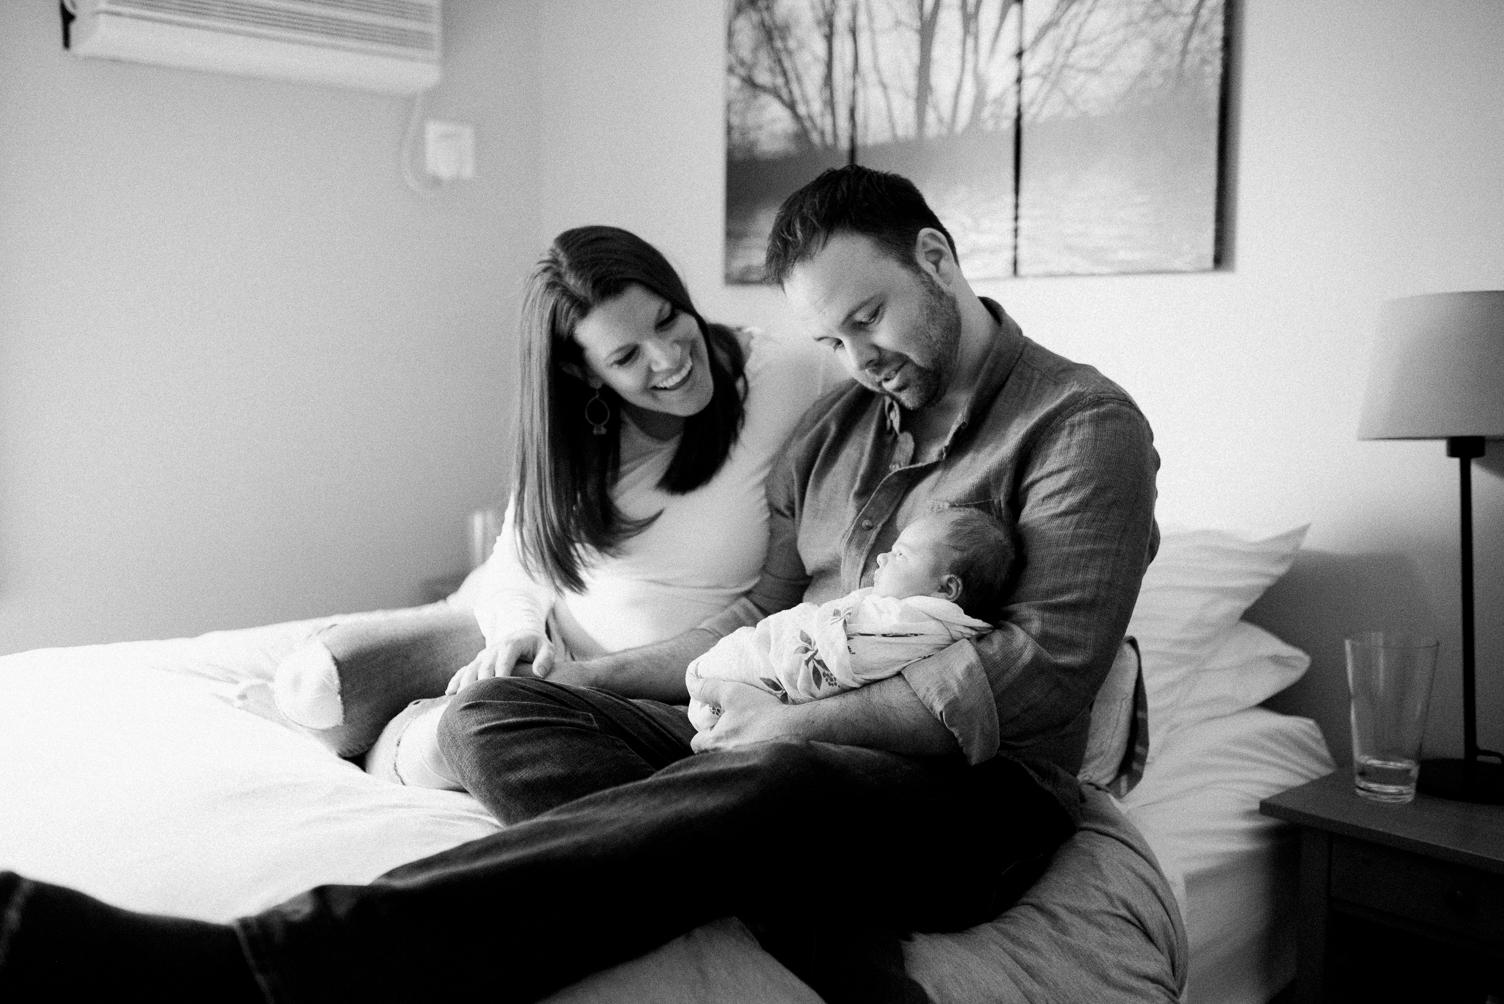 Newborn-photographer-BKLP-Baltimore-Maryland-Brooklyn-New York-lifestyle-photography-Breanna Kuhlmann-24.jpg